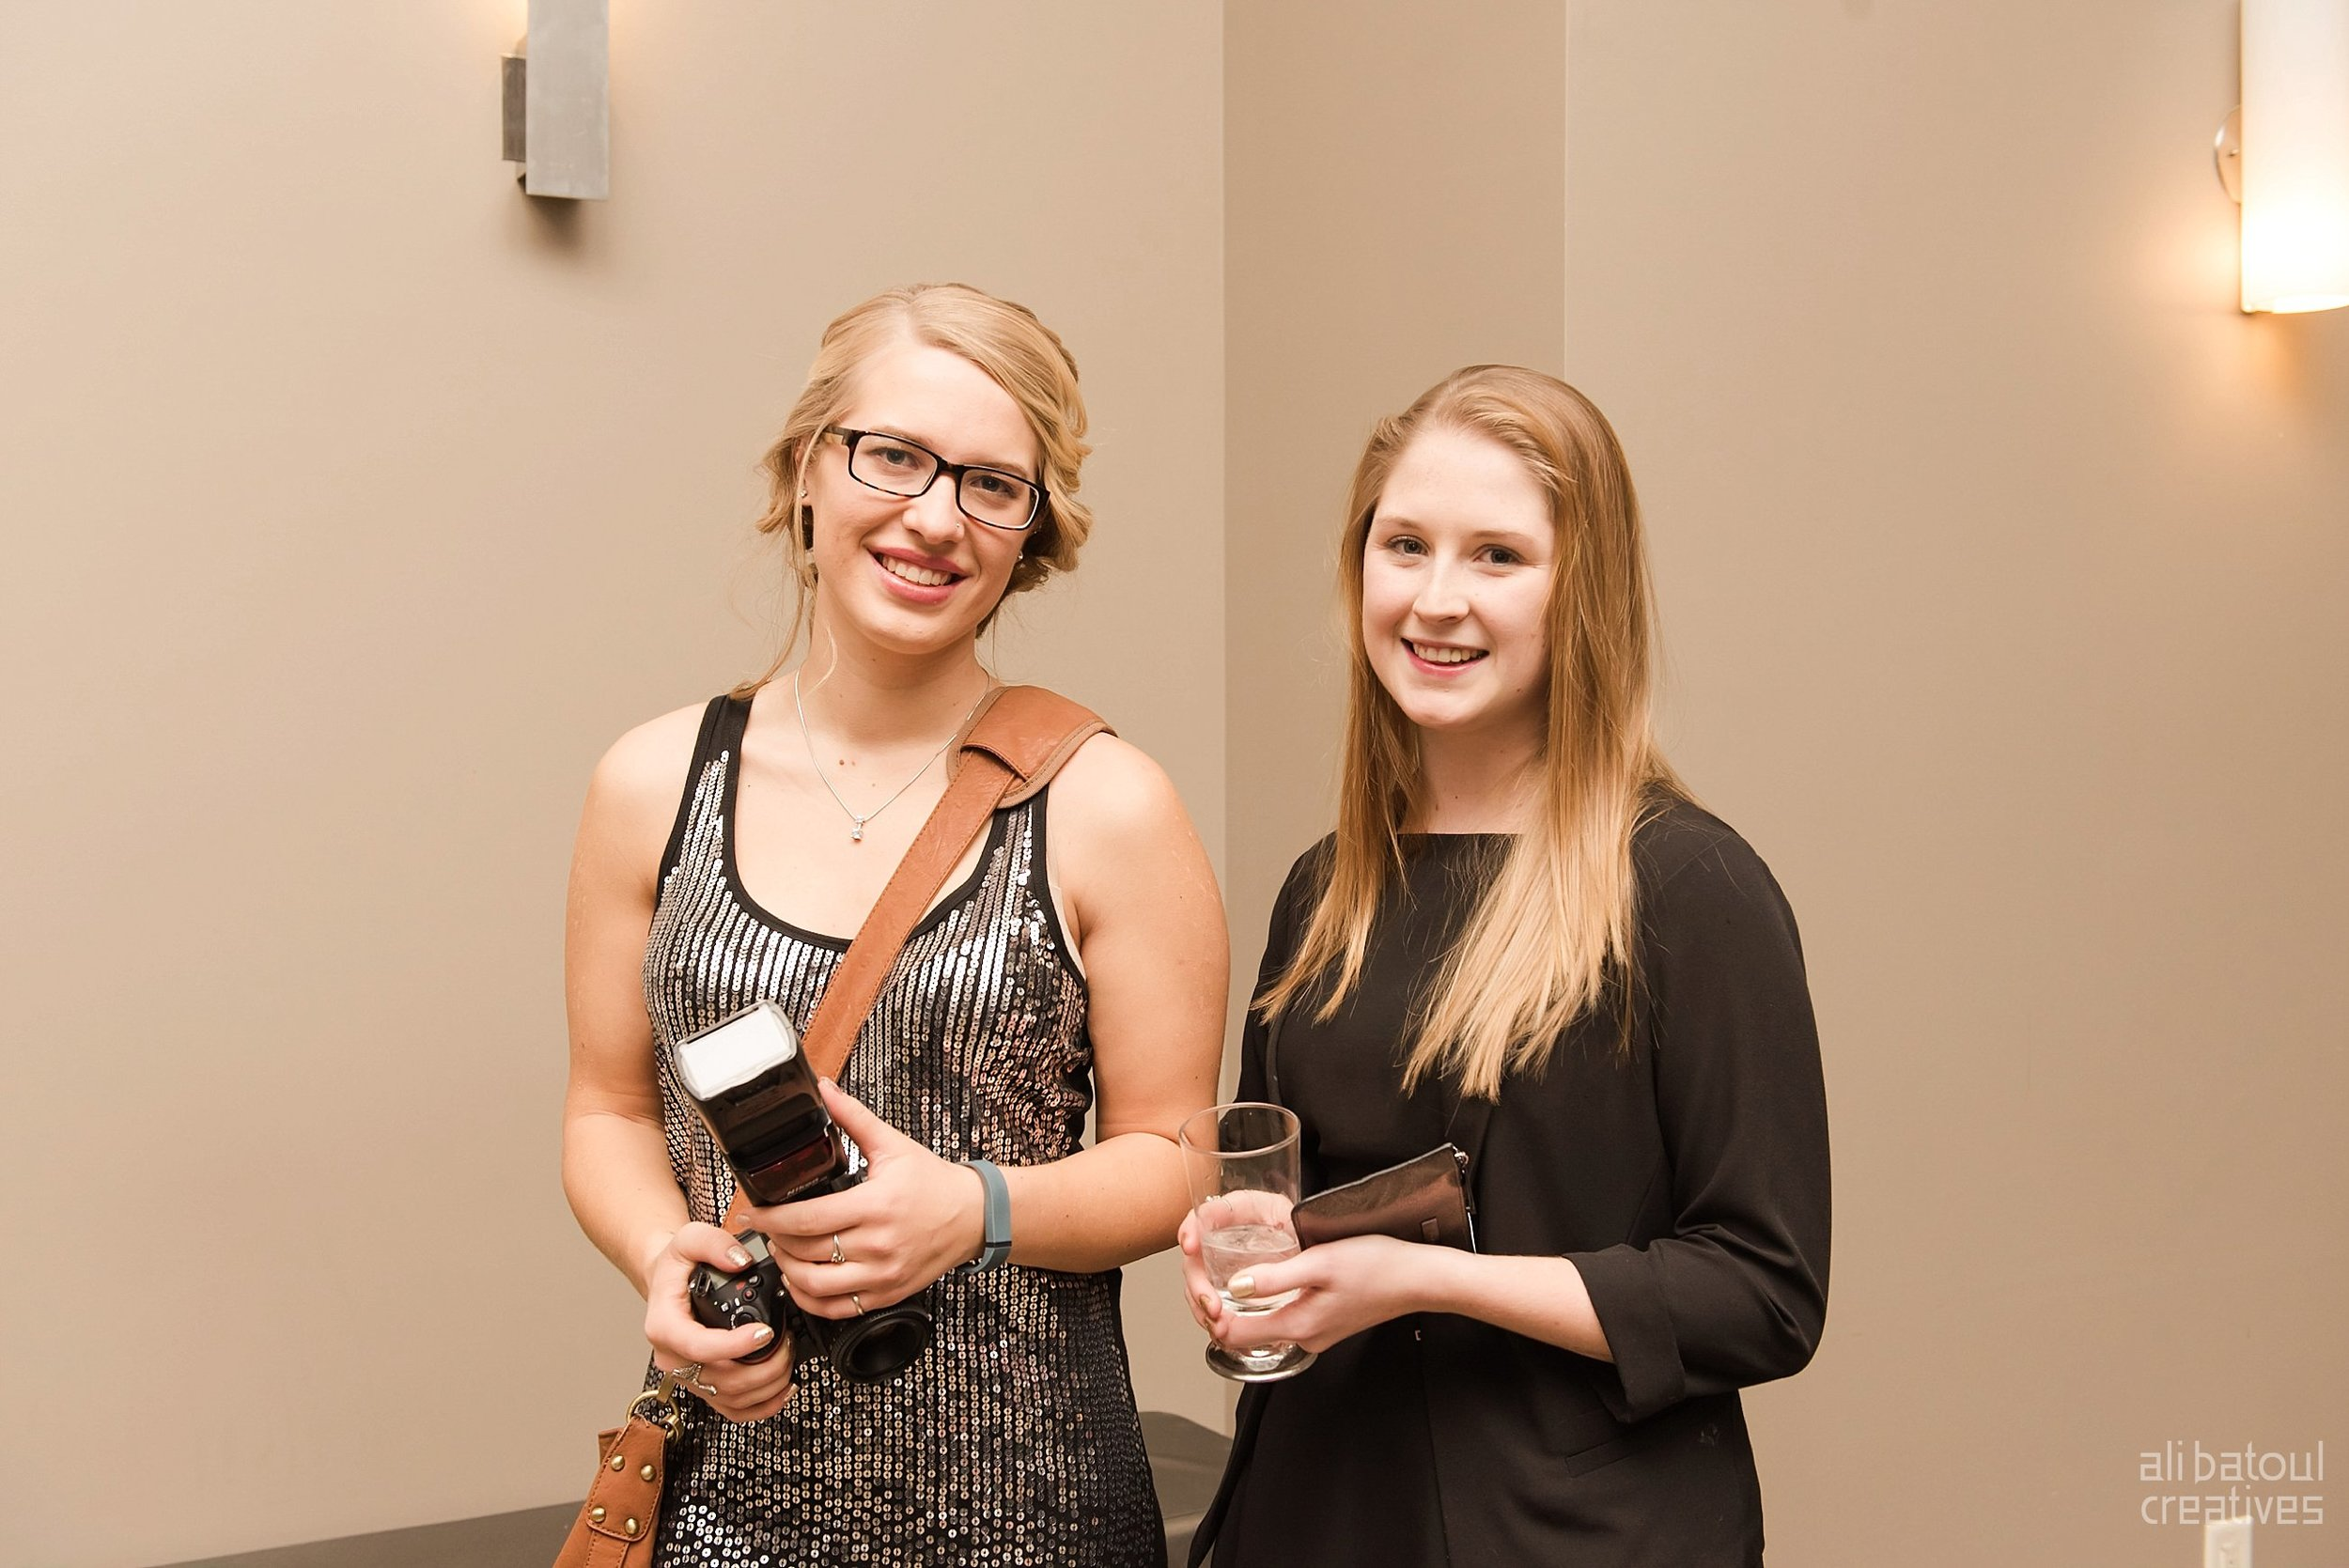 Photographed alongside Nicole Amanda!